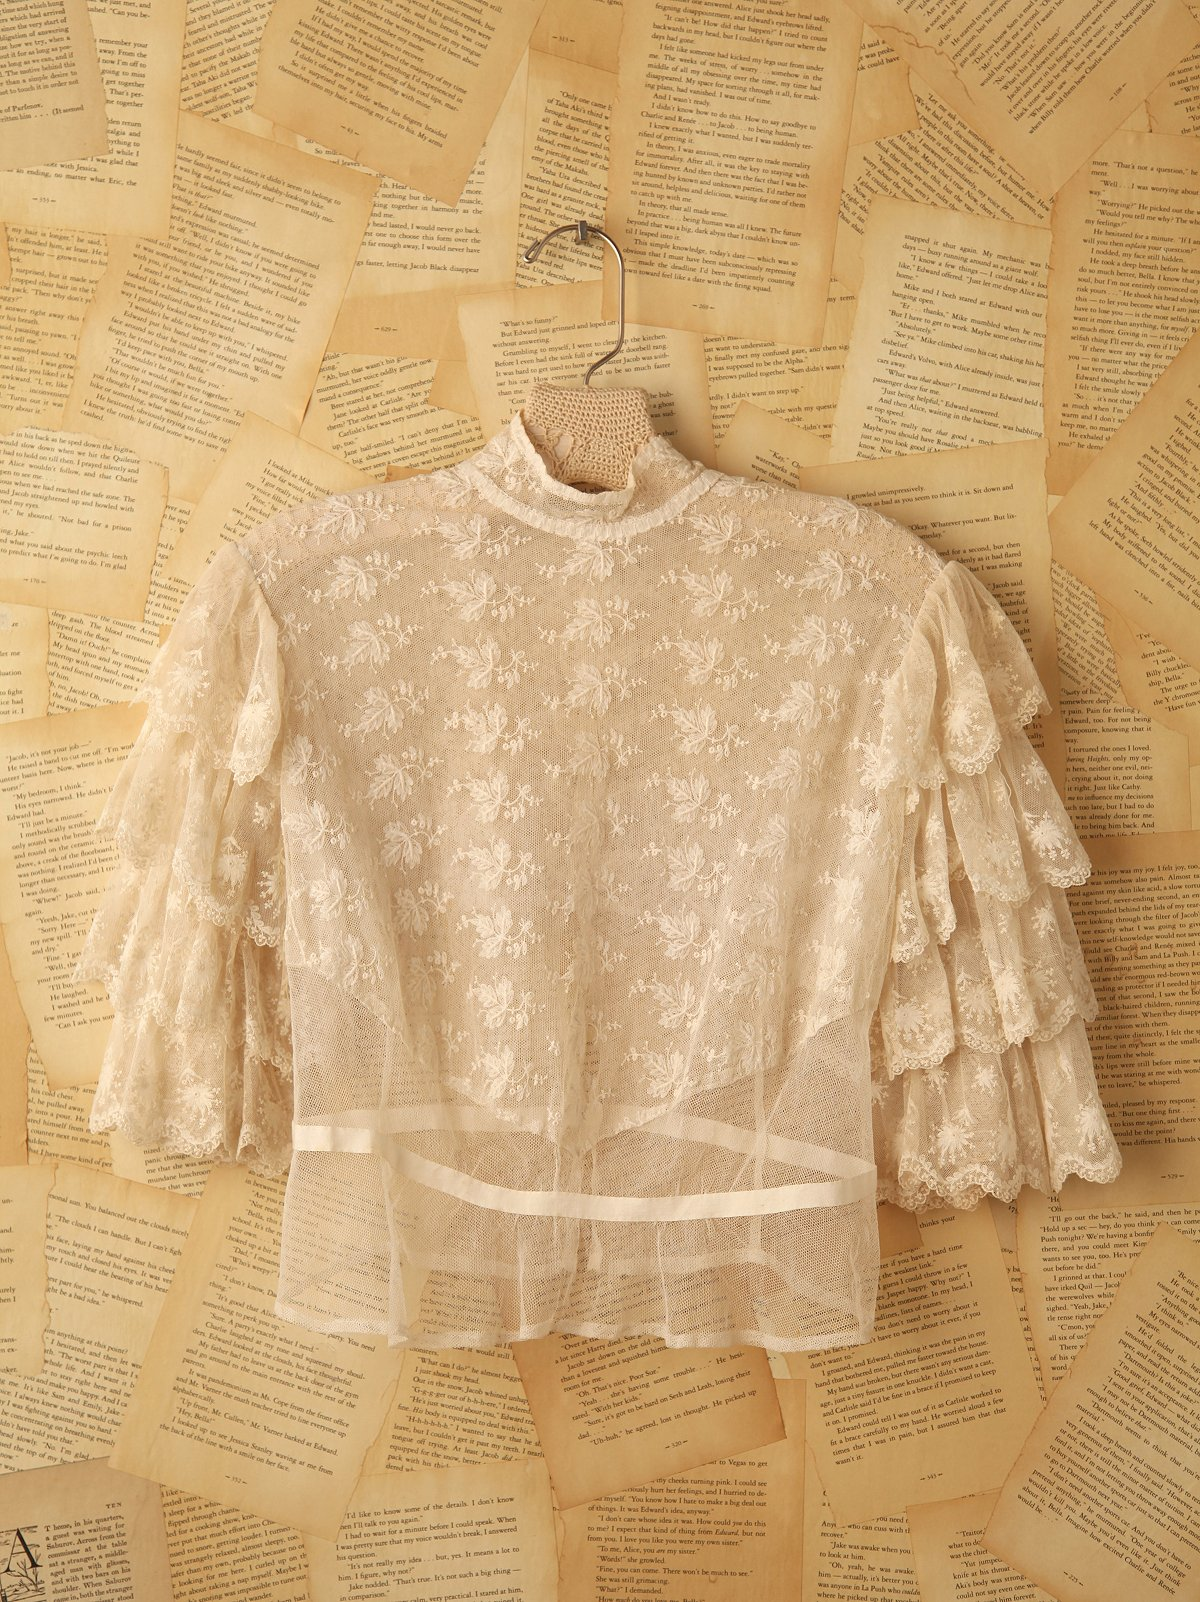 Vintage Lace Bodice Top